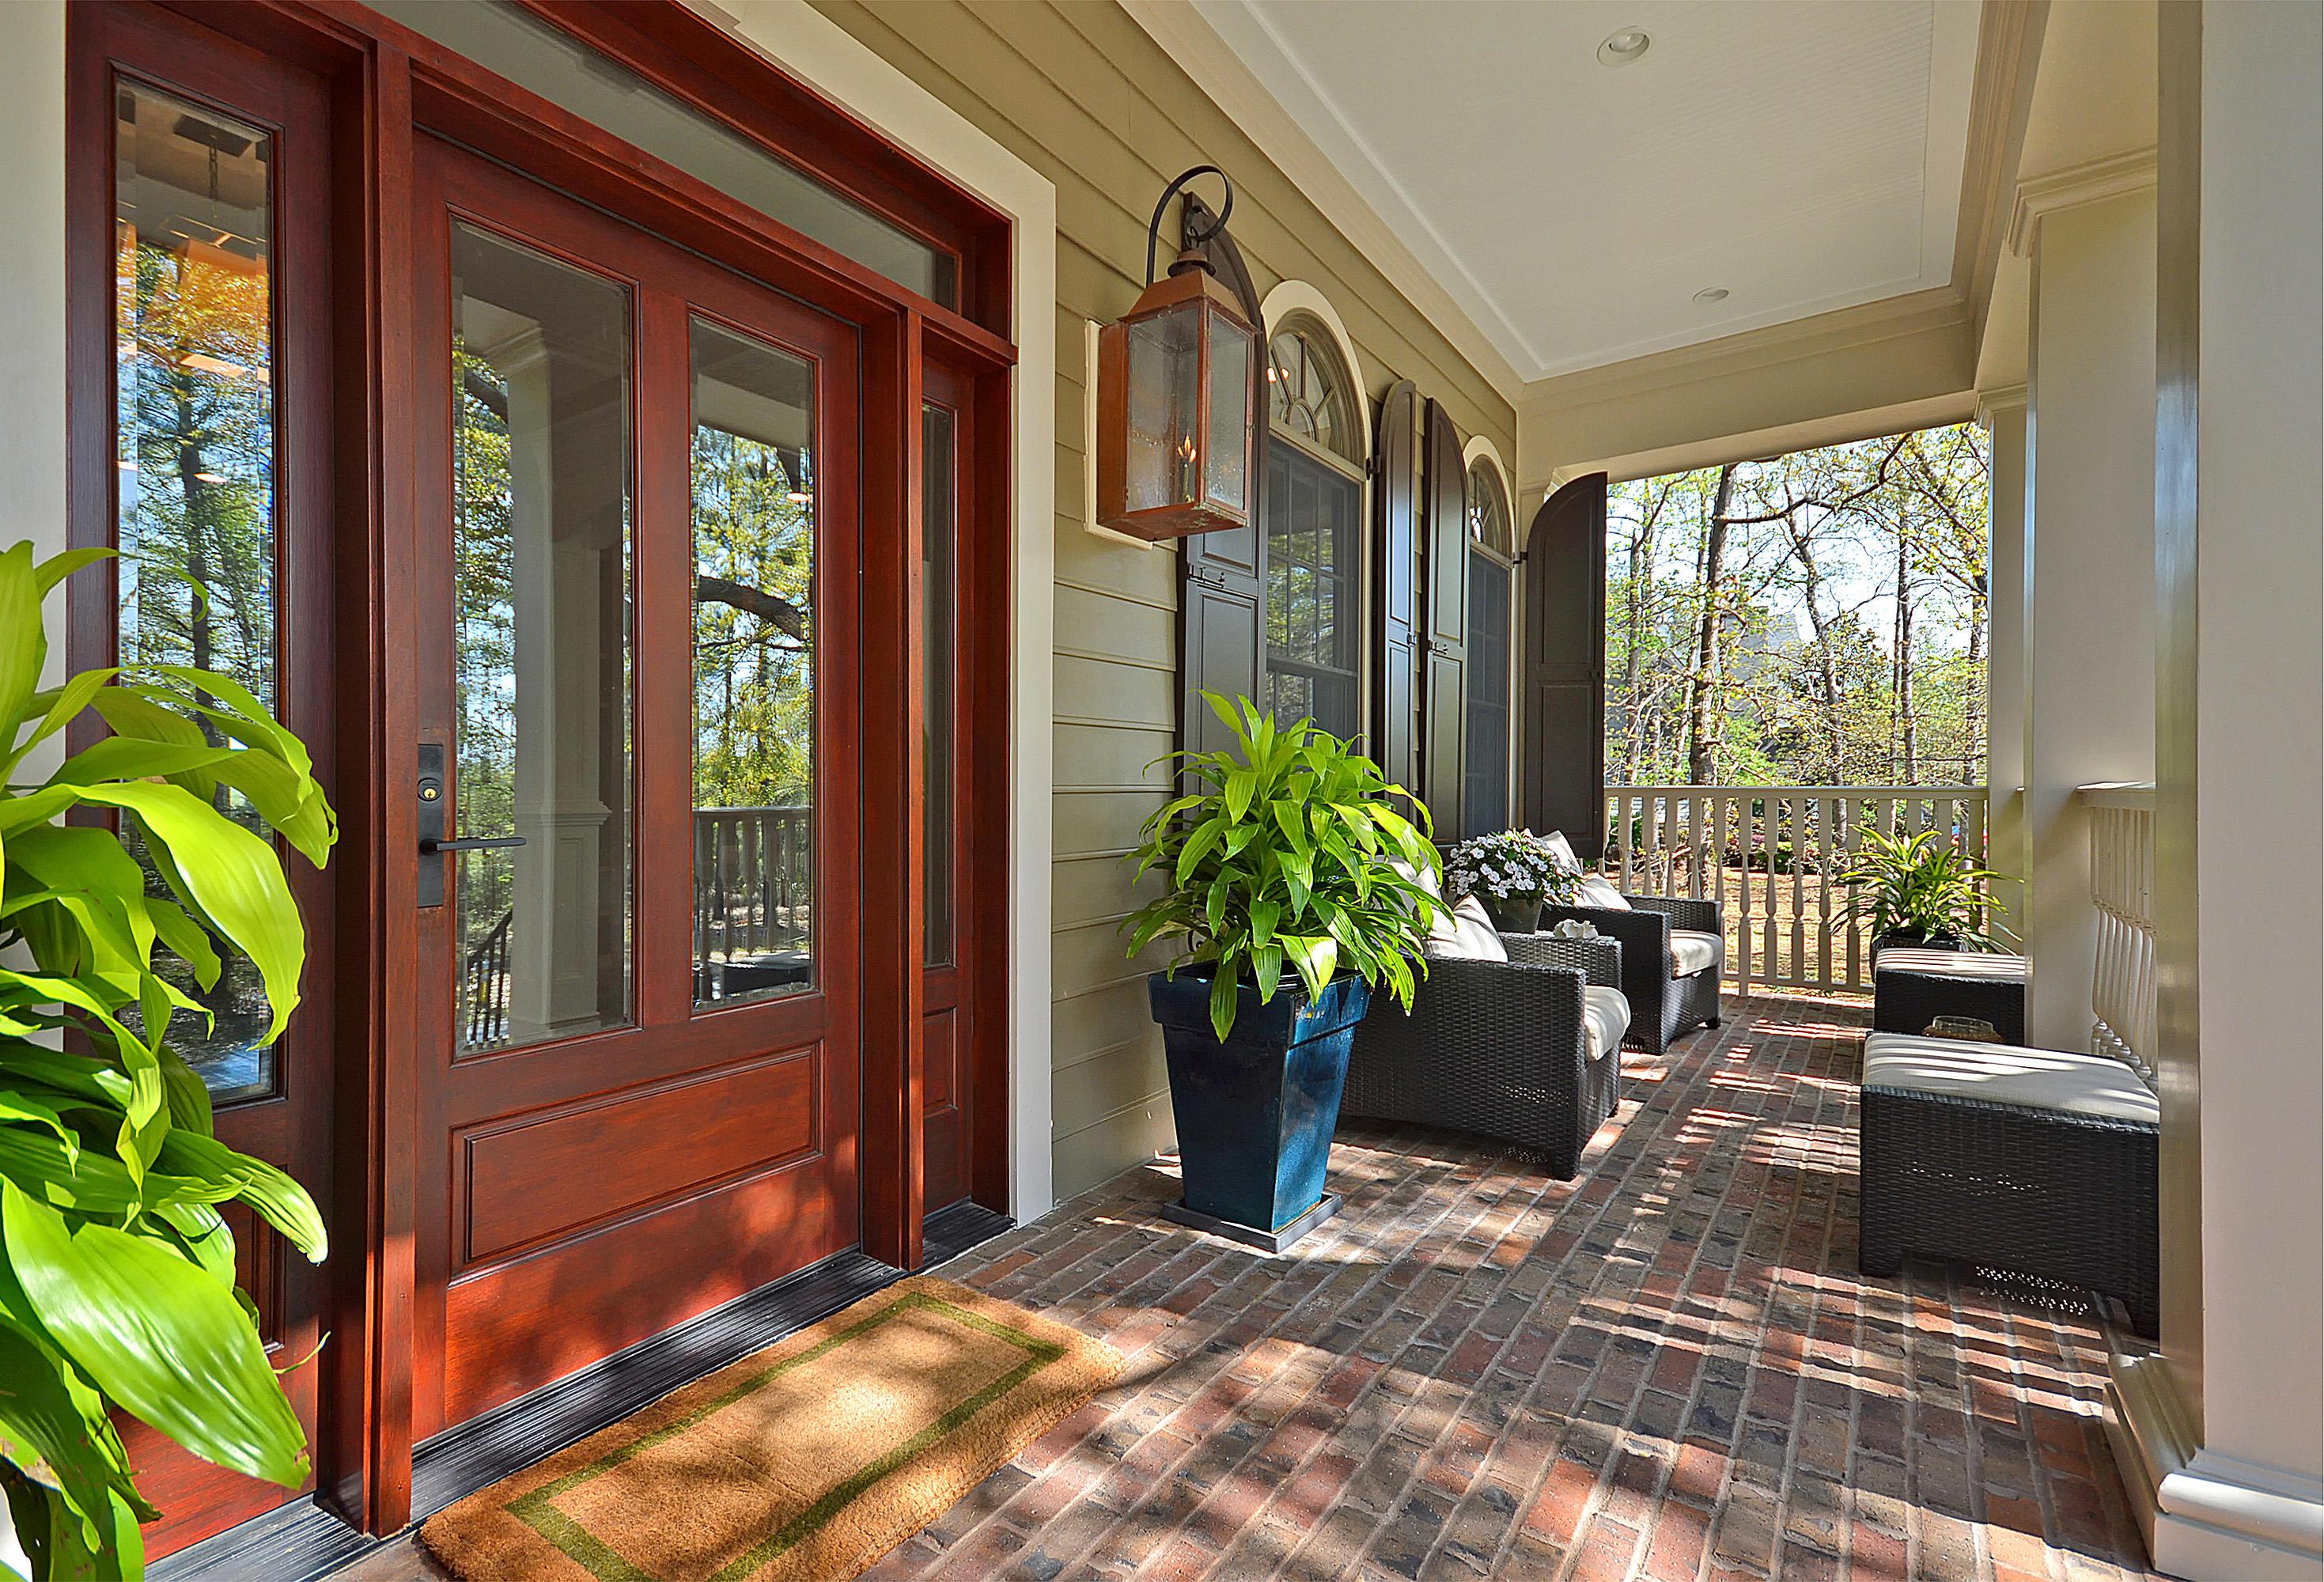 Daniel Island Homes For Sale - 41 Watroo, Charleston, SC - 38